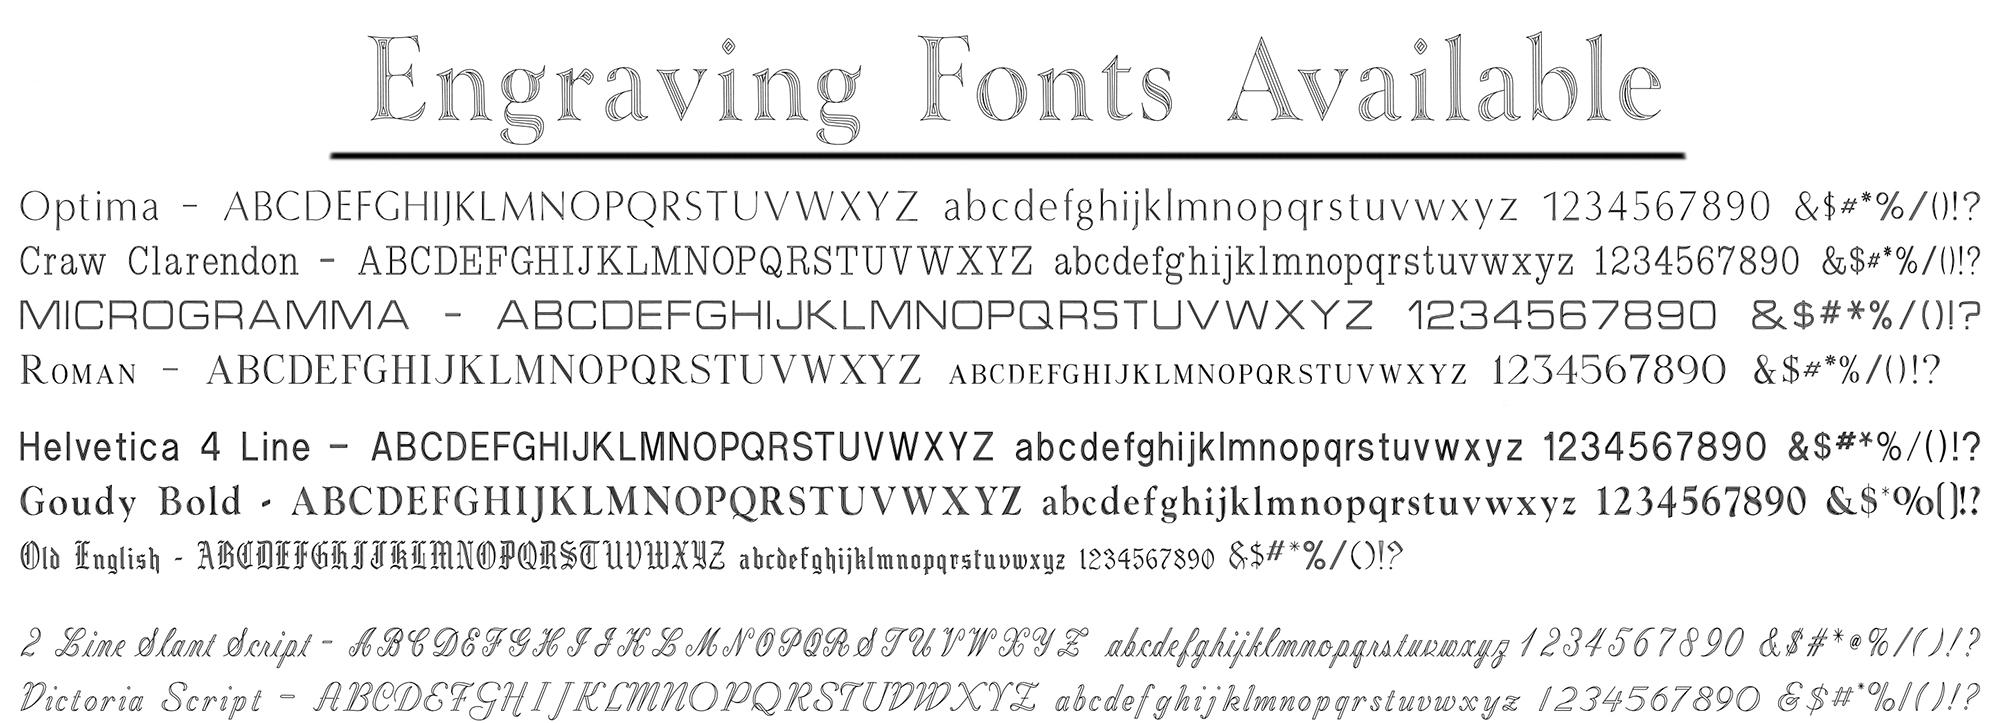 american-edge-engraving-fonts.jpg